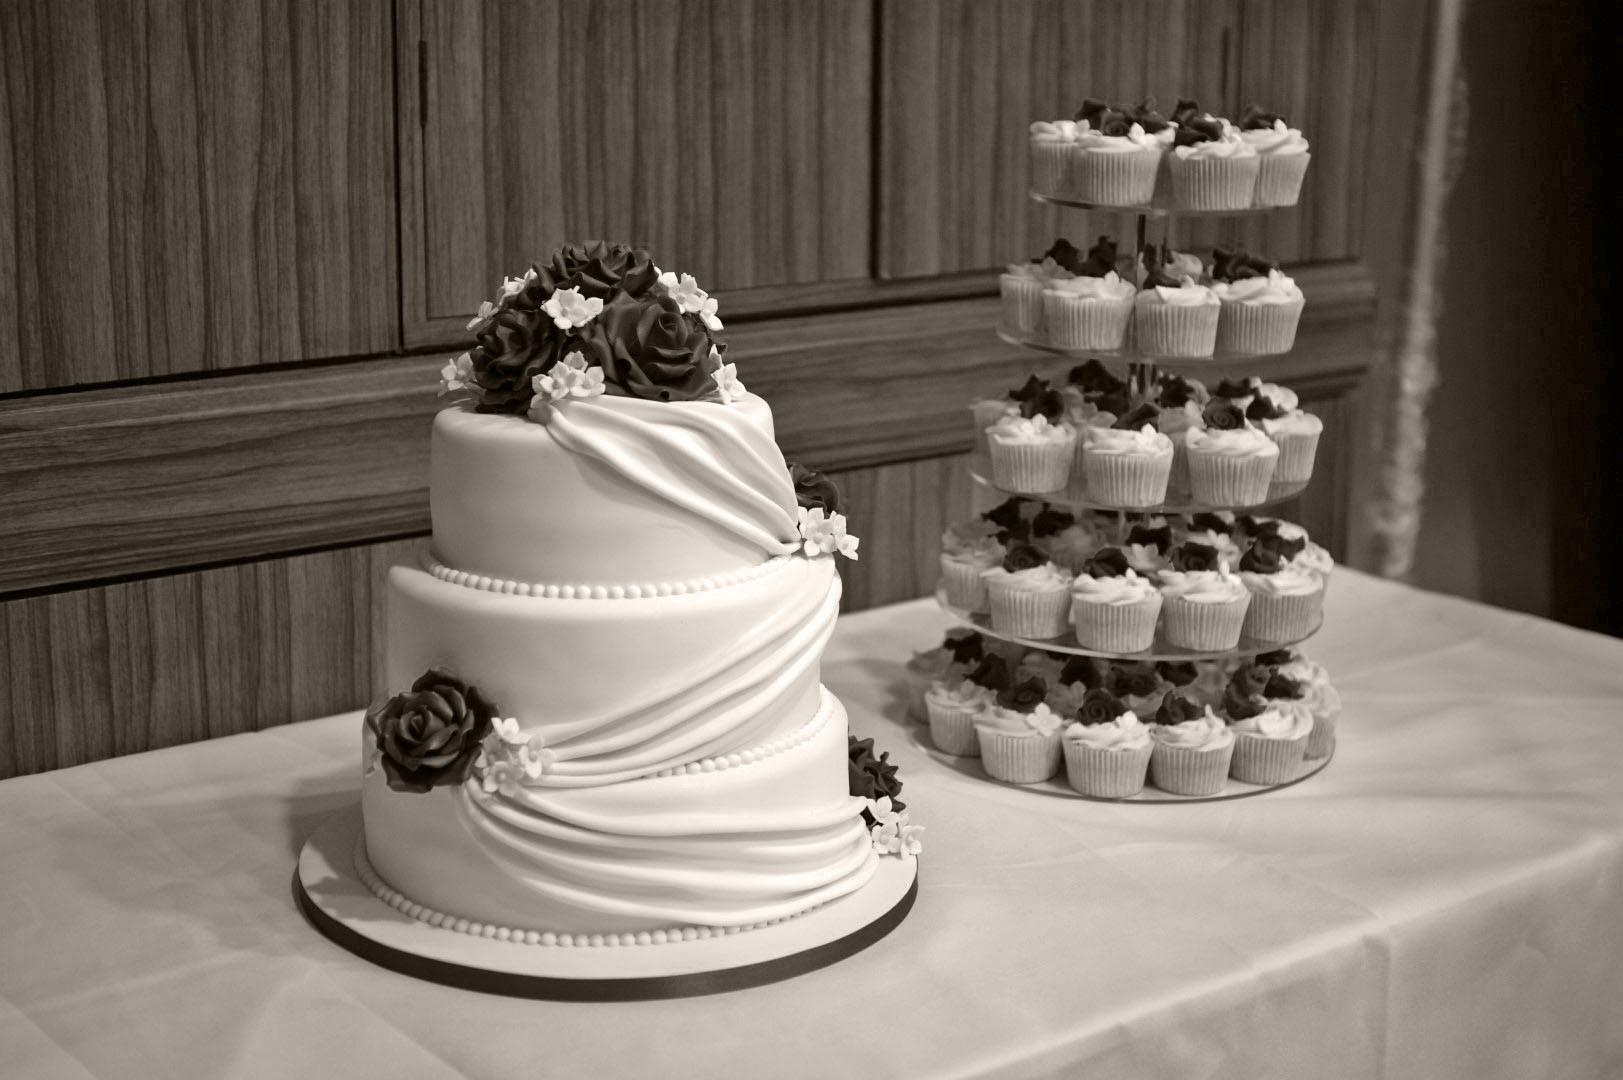 Three Tear Wedding Cakes  3 Tier Wedding Cake with Cupcake Tower Bakealous